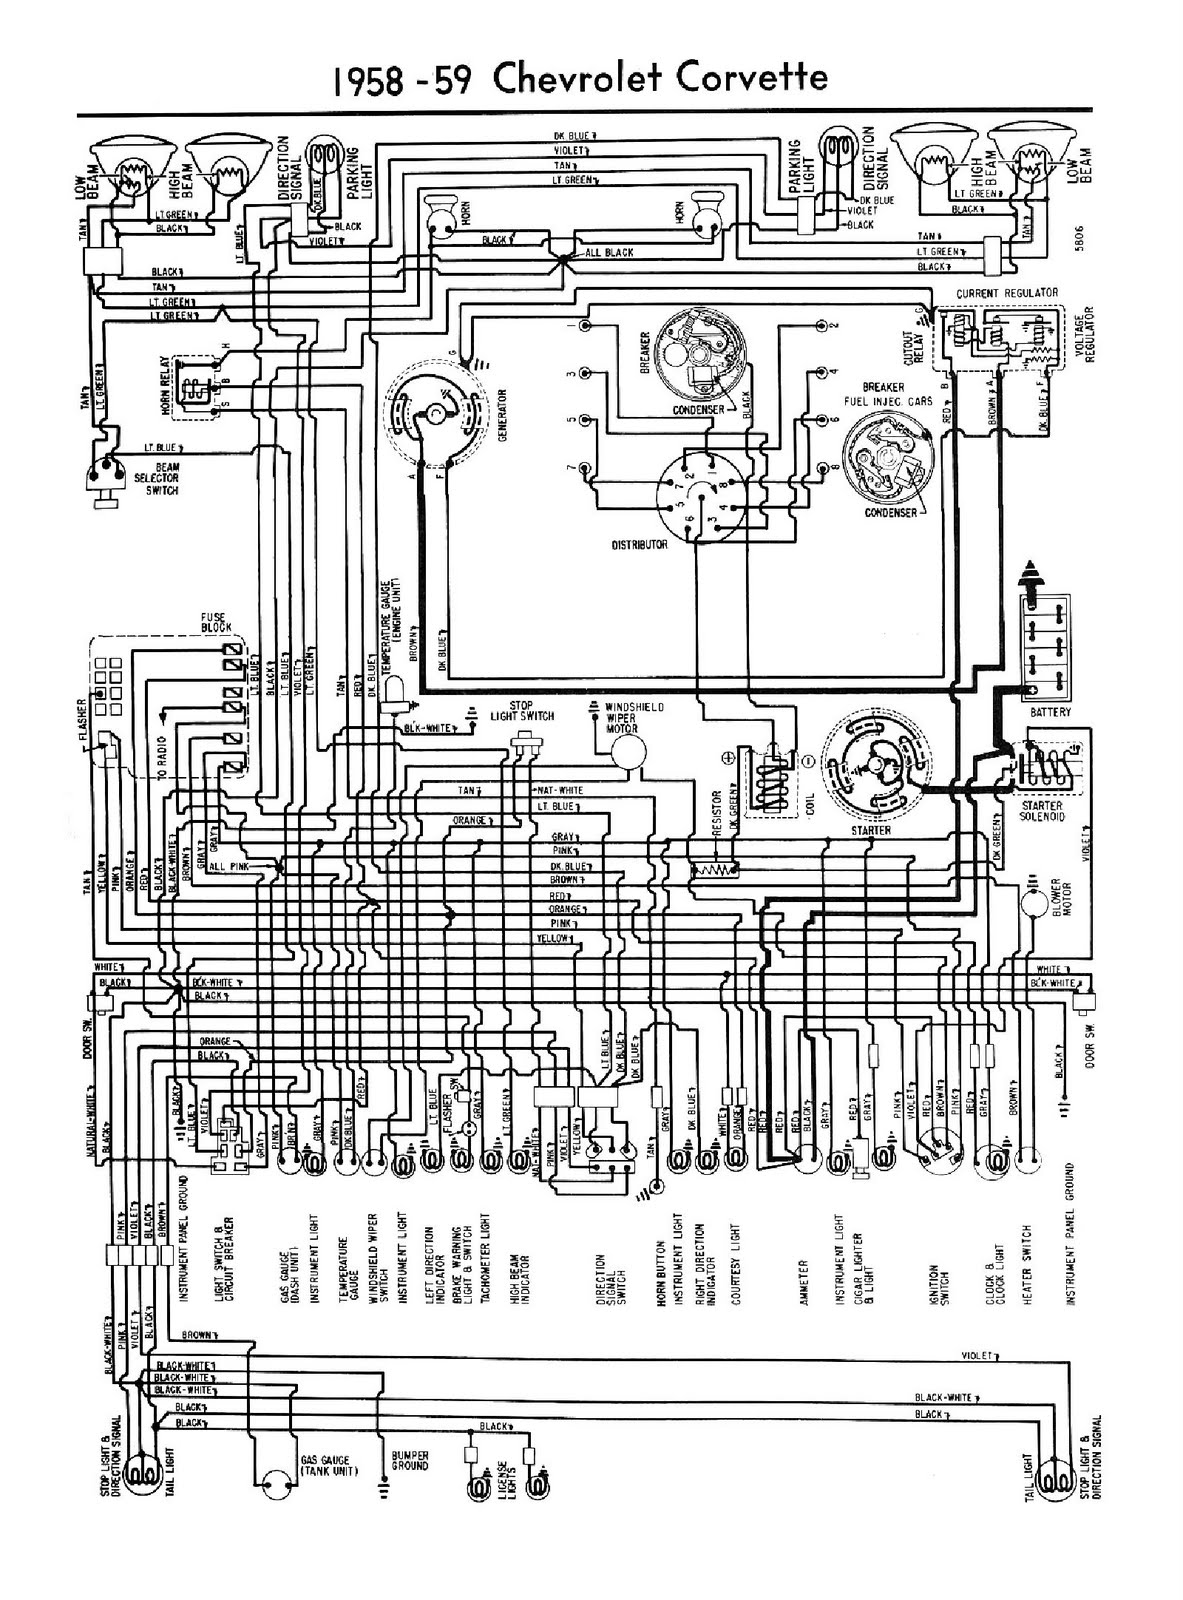 √ 1959 Ford F100 Ignition Wiring Diagram   1965 F100 ...  Ford F Wiring Schematics on 1968 ford truck schematic schematic, ford ranger brake line schematic, 1964 ranchero wiring schematic,